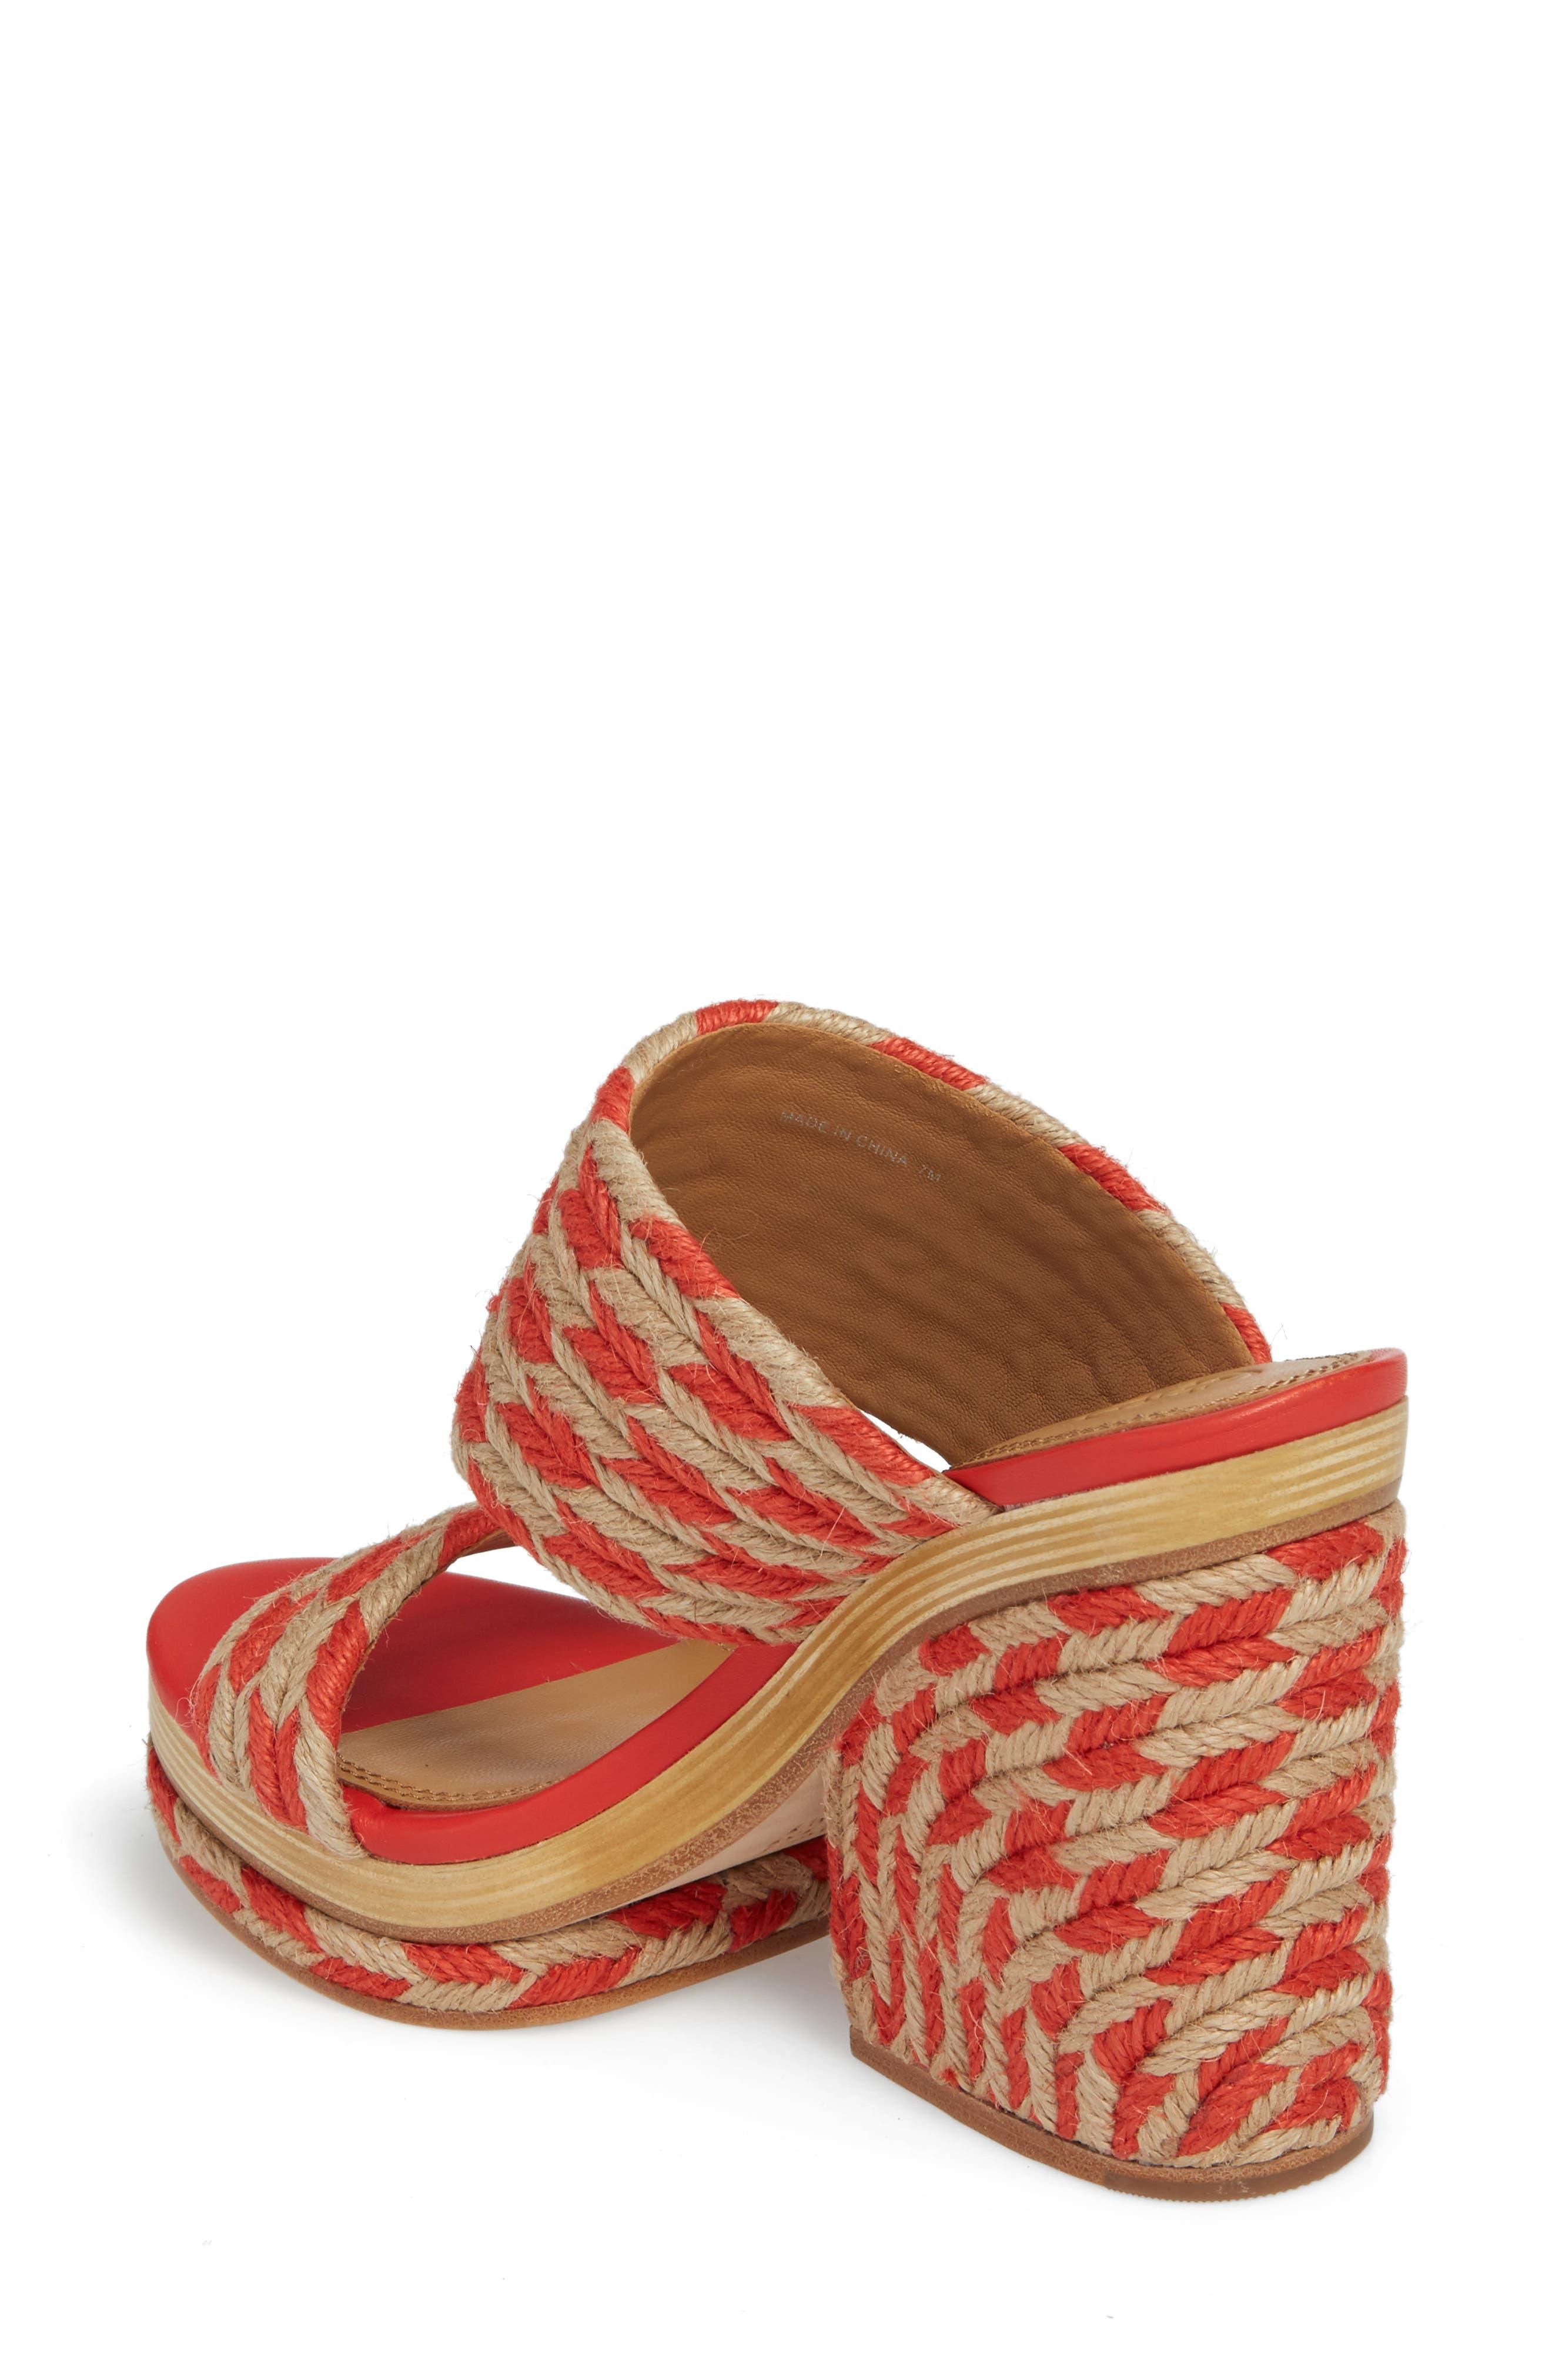 Lola Woven Platform Sandal,                             Alternate thumbnail 2, color,                             Poppy Orange/ Perfect Ivory